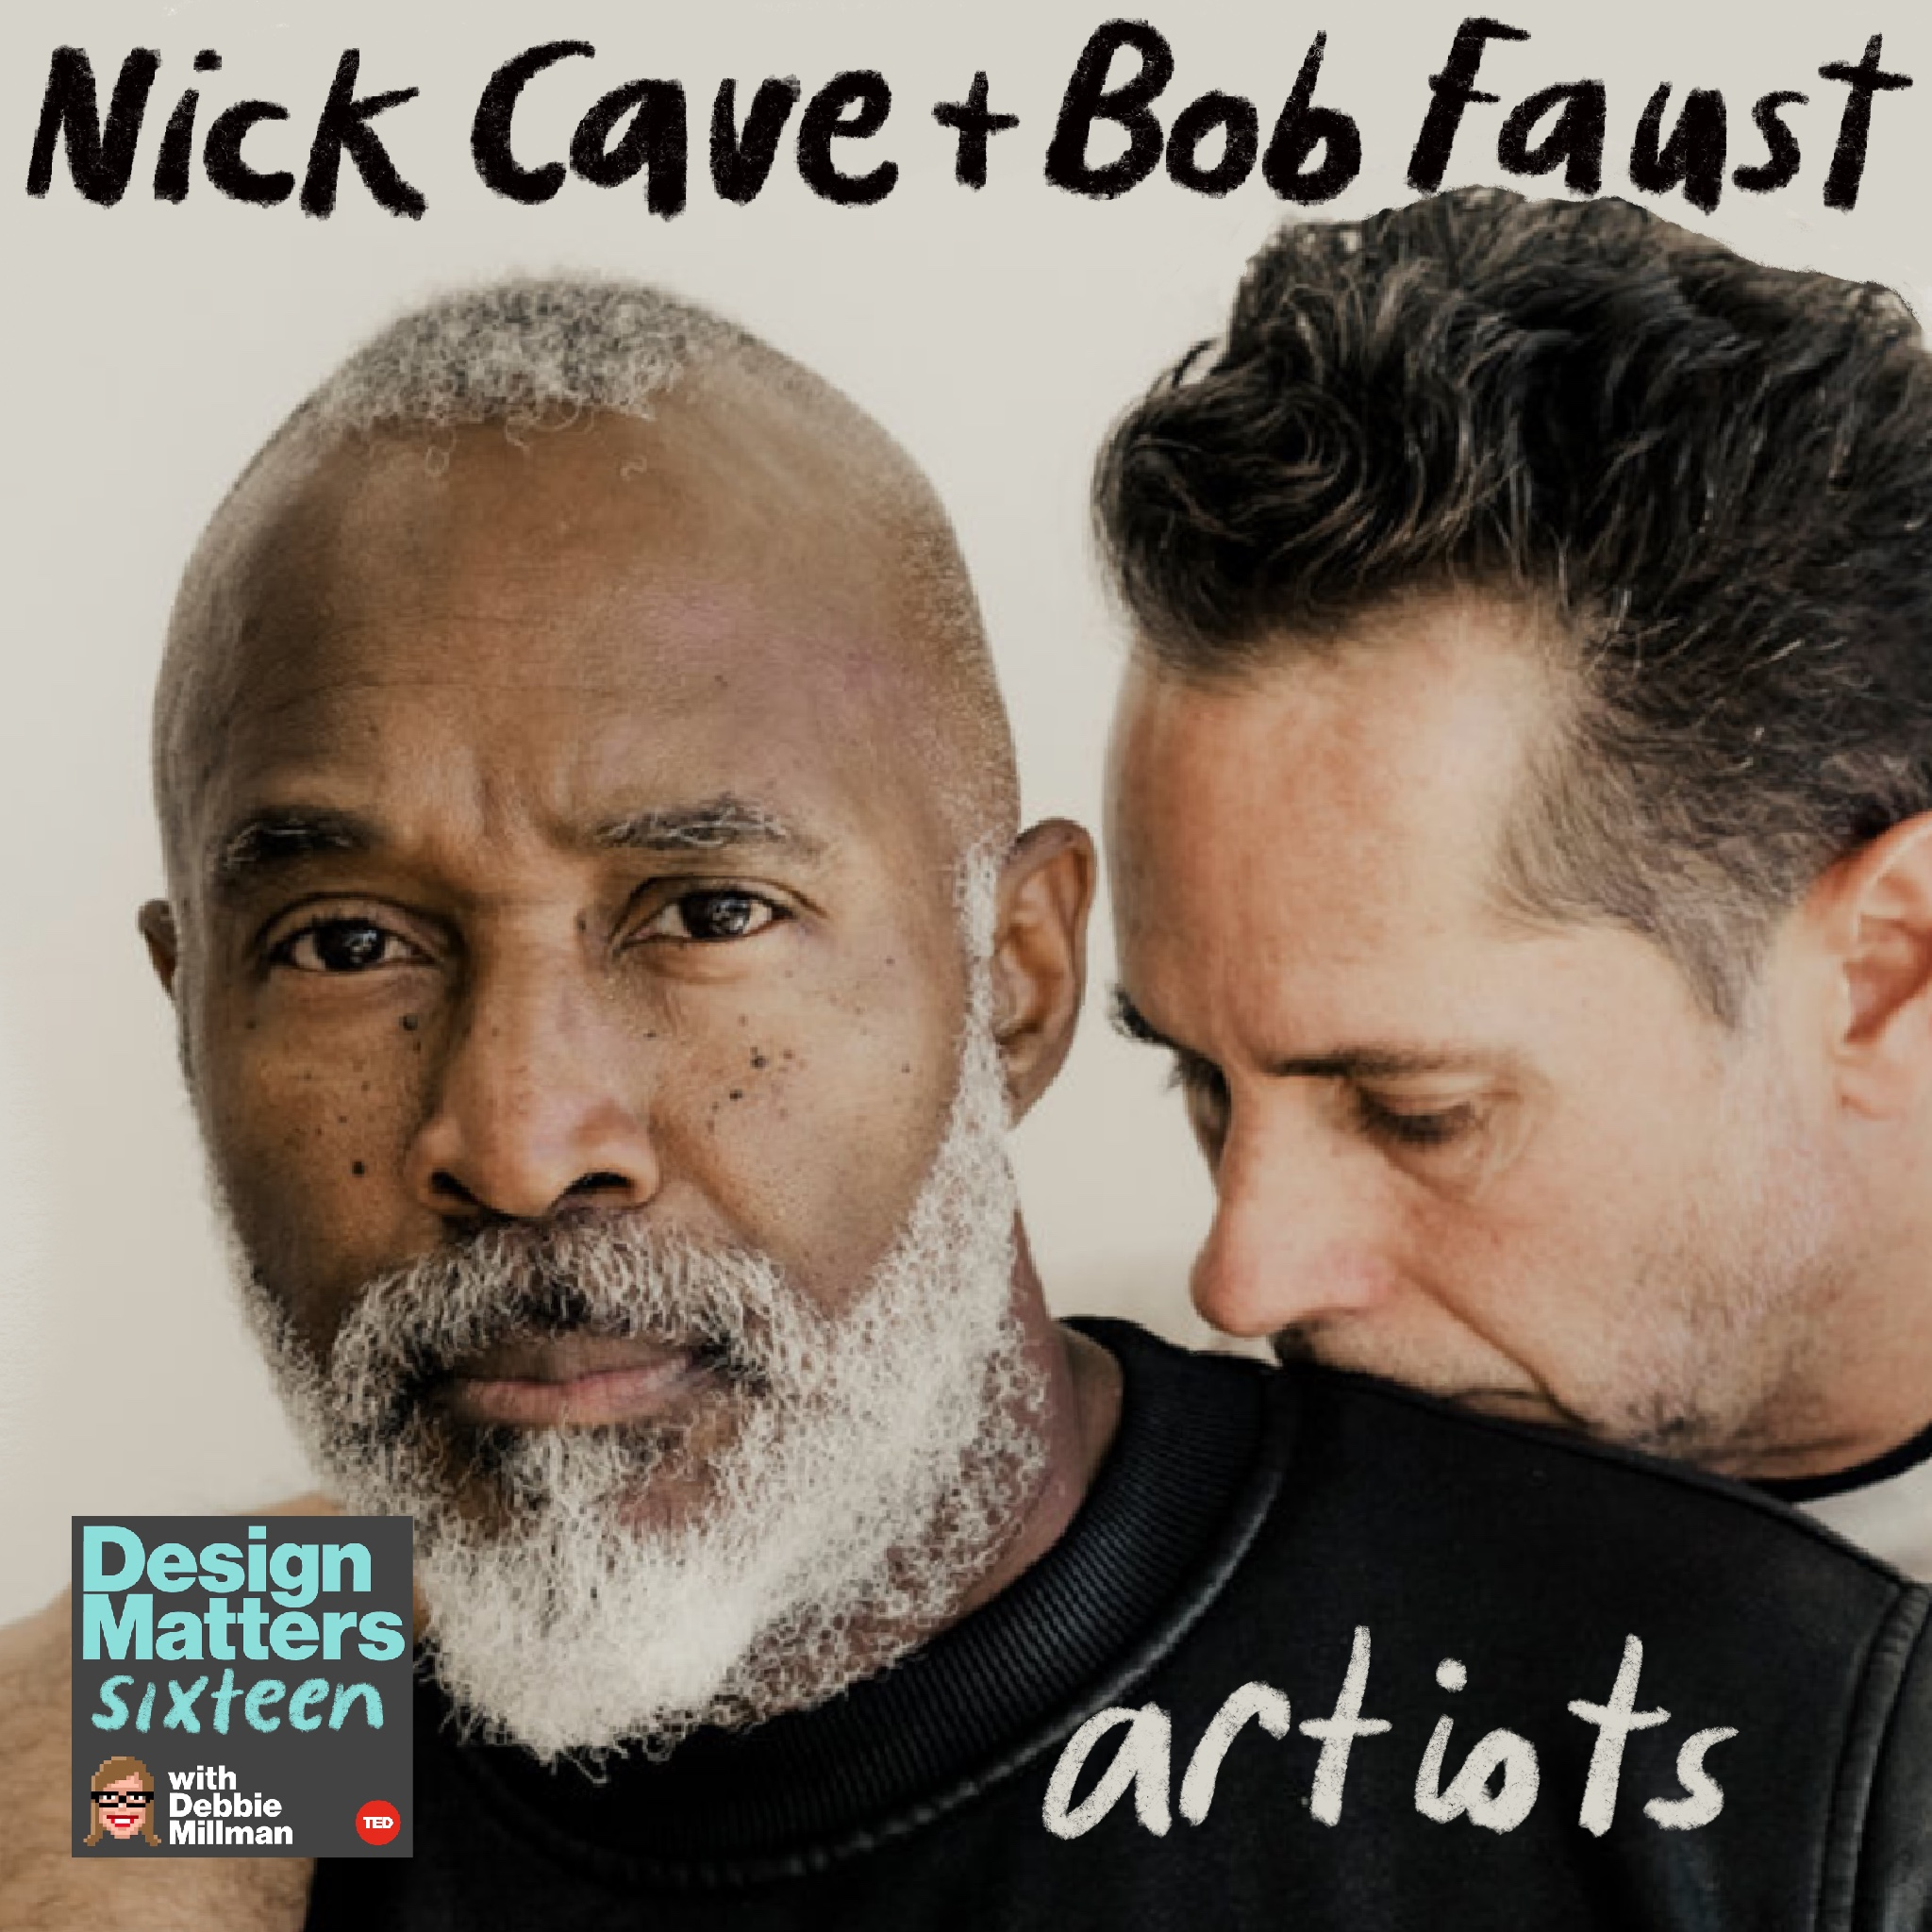 Nick Cave & Bob Faust